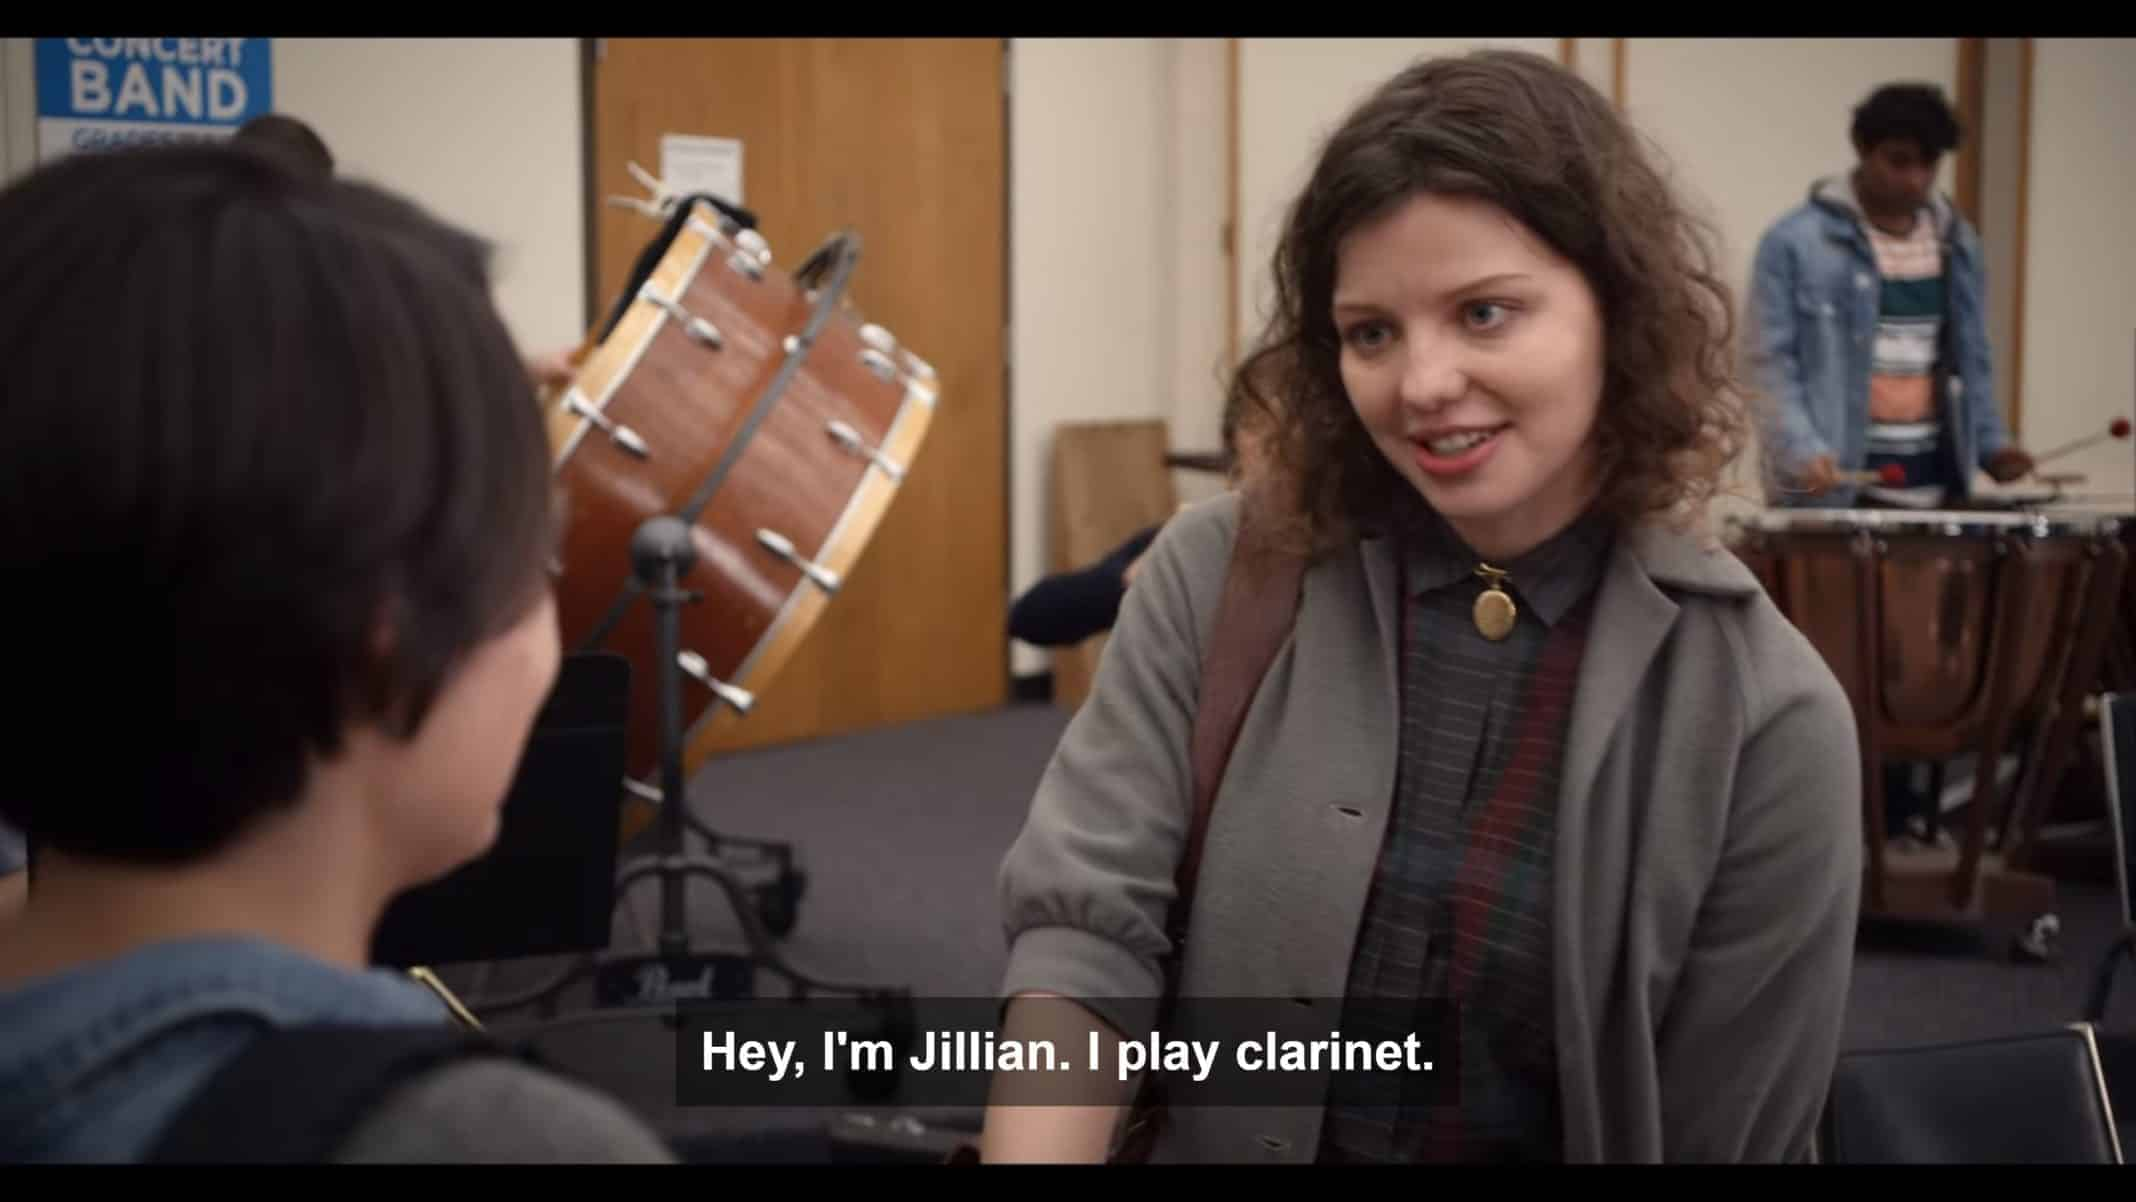 Jillian (Chloe Levine) introducing herself.